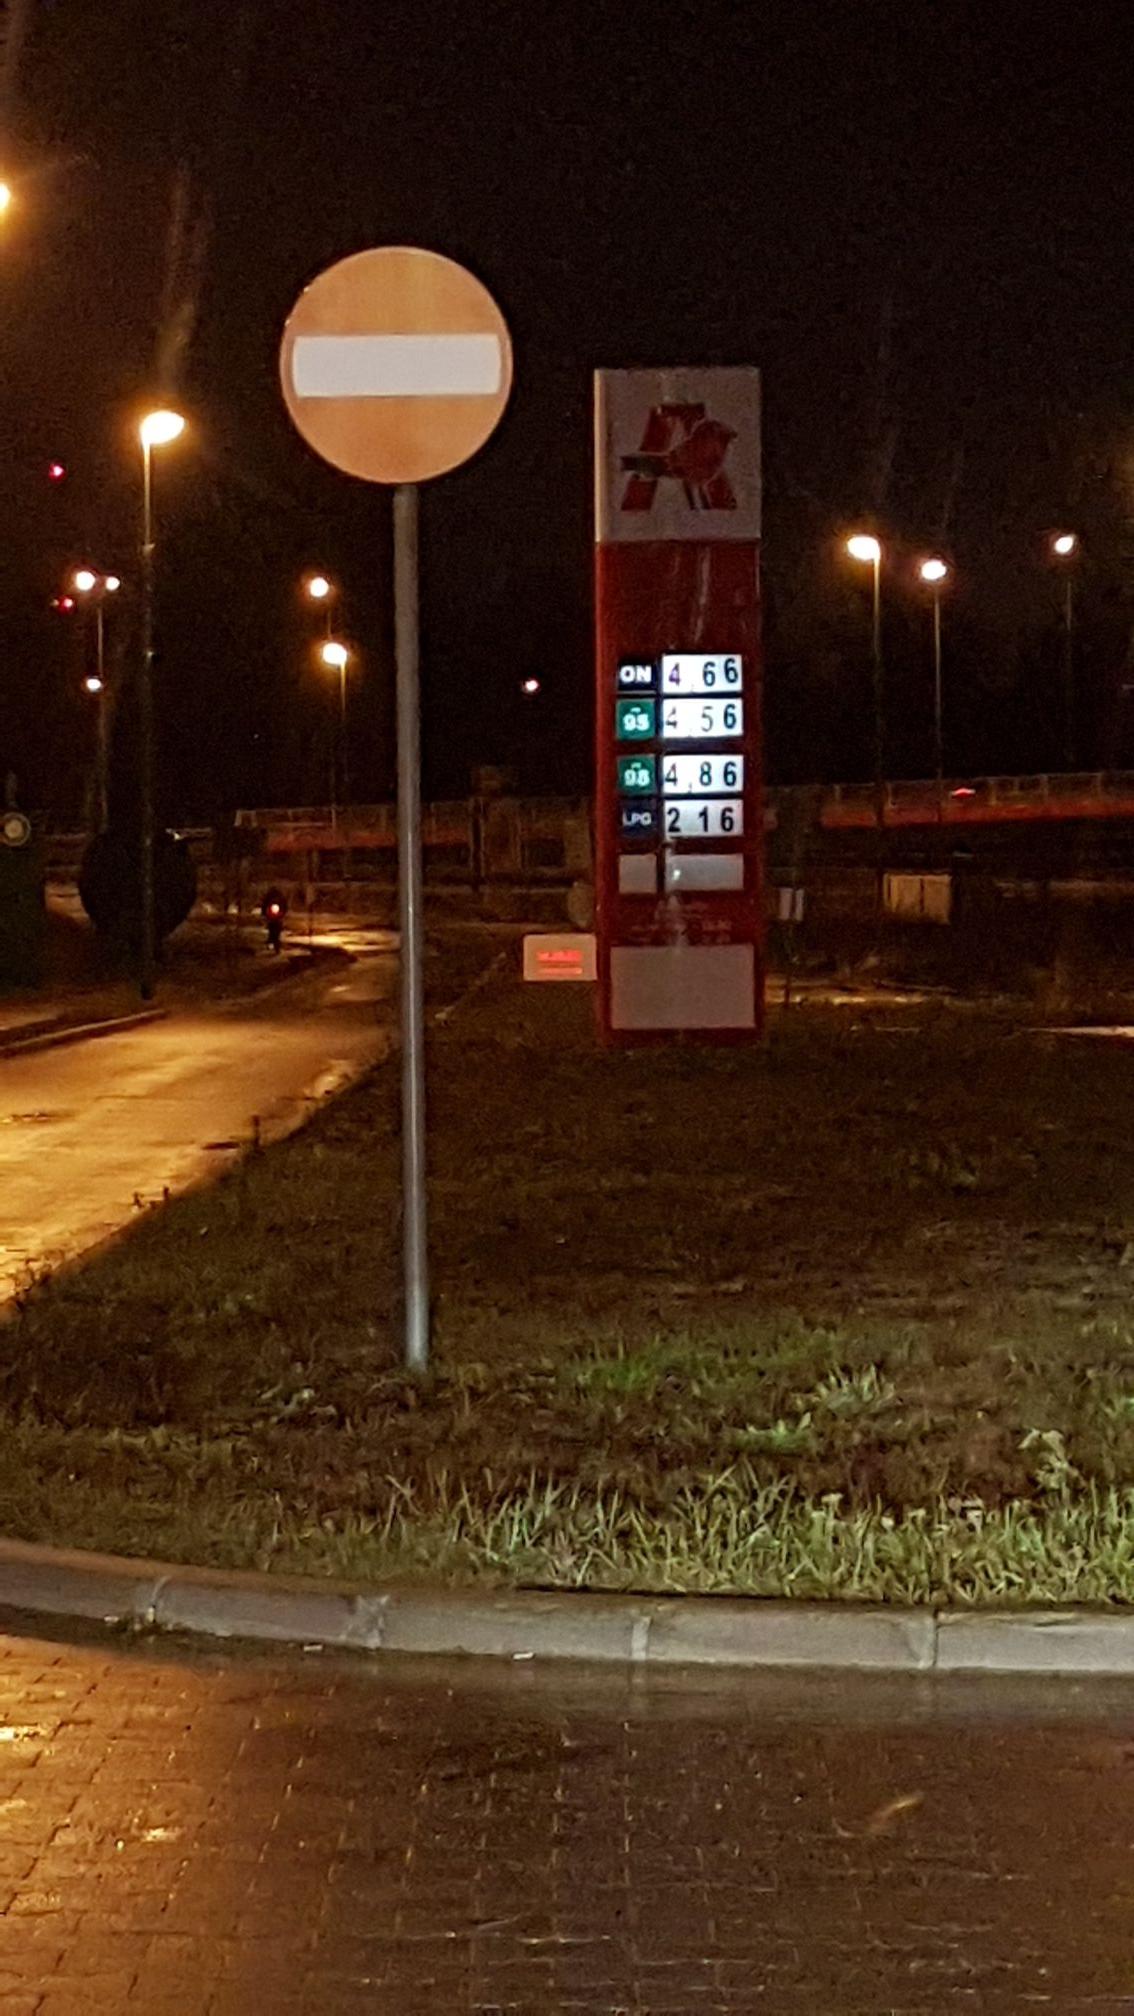 Paliwo Diesel ON 4.66 zl Auchan, Szczecin, Ustowo